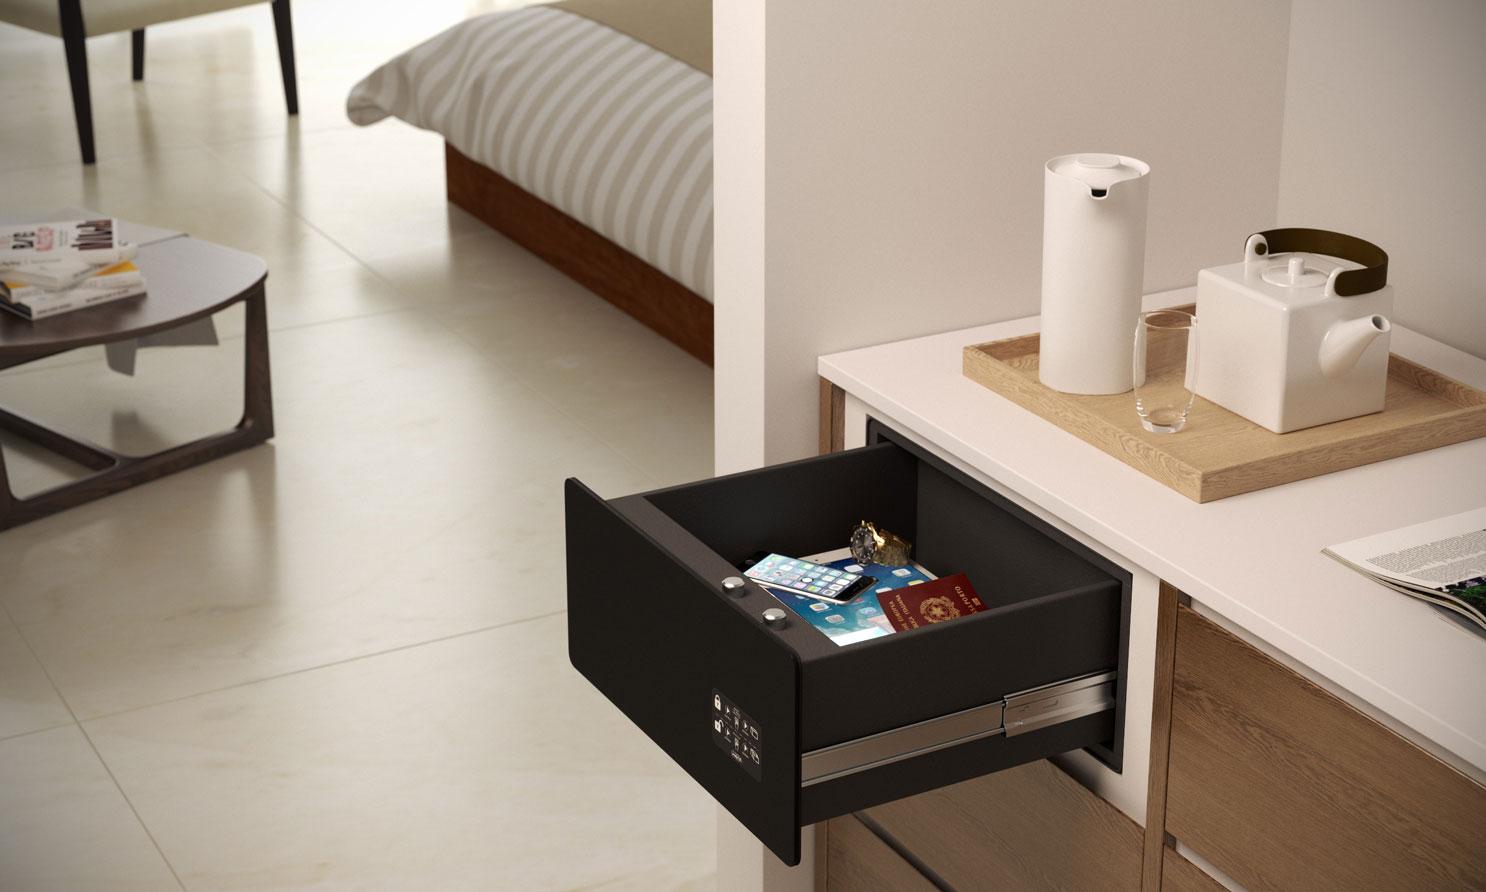 Caja Safe Drawer, en forma de cajón